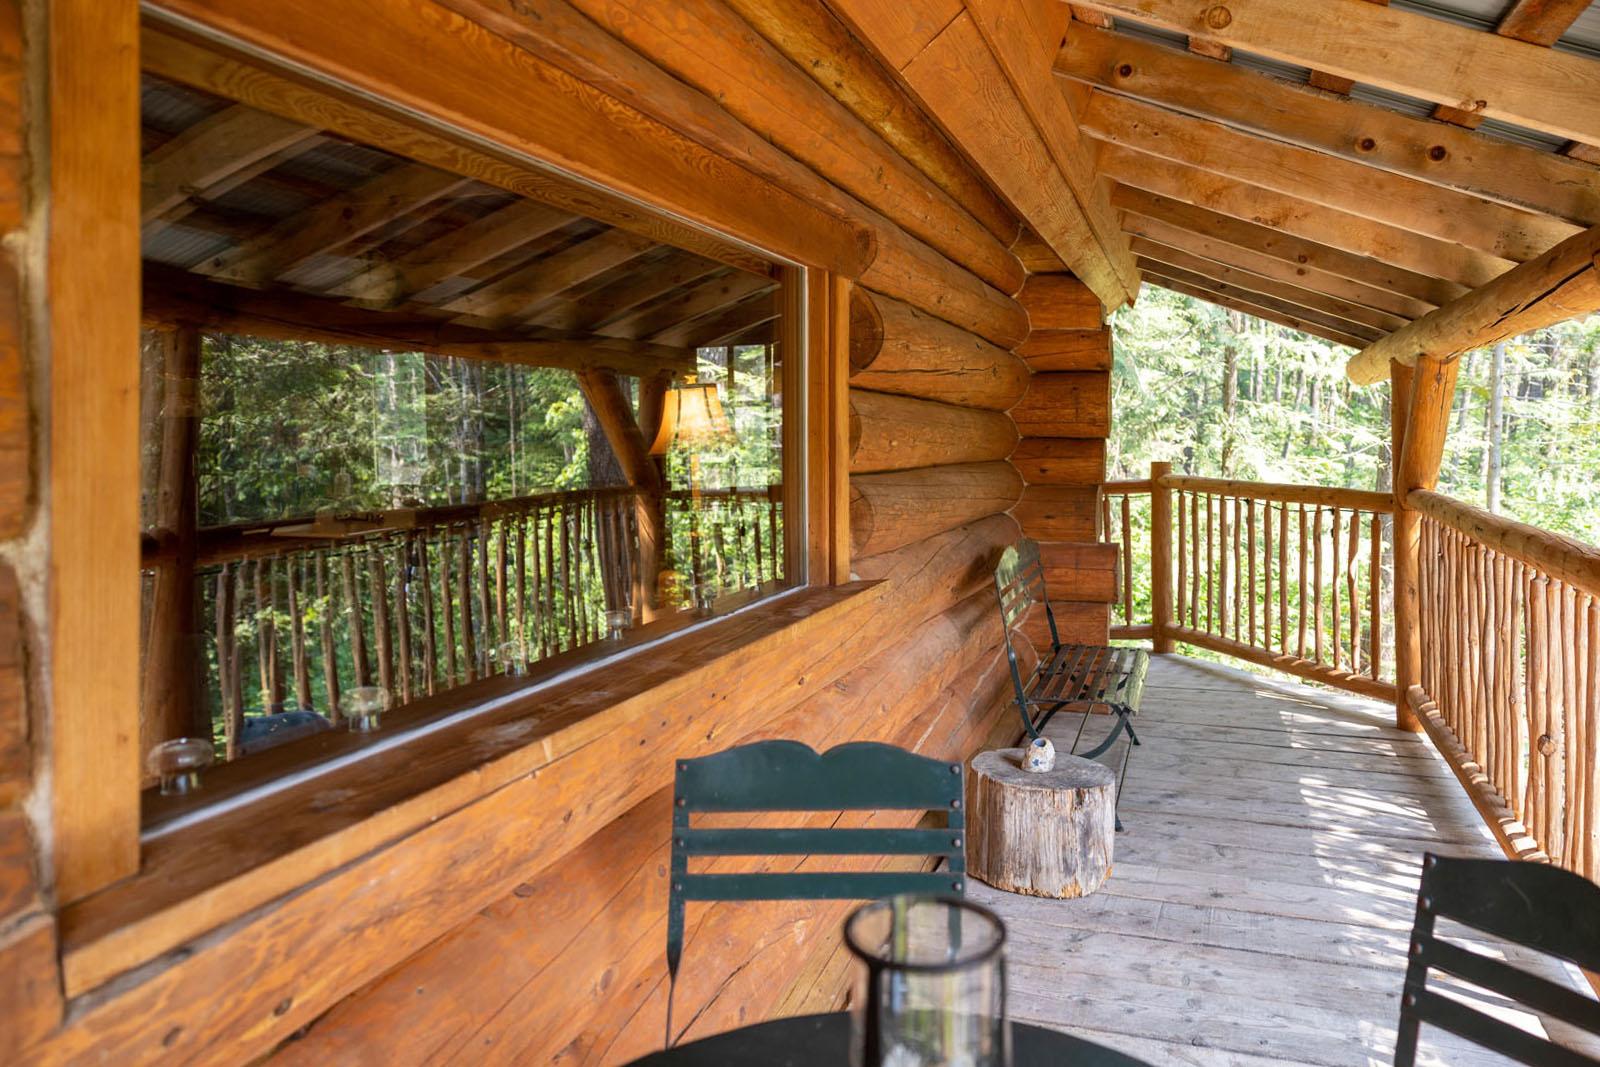 Mount robson log home 26